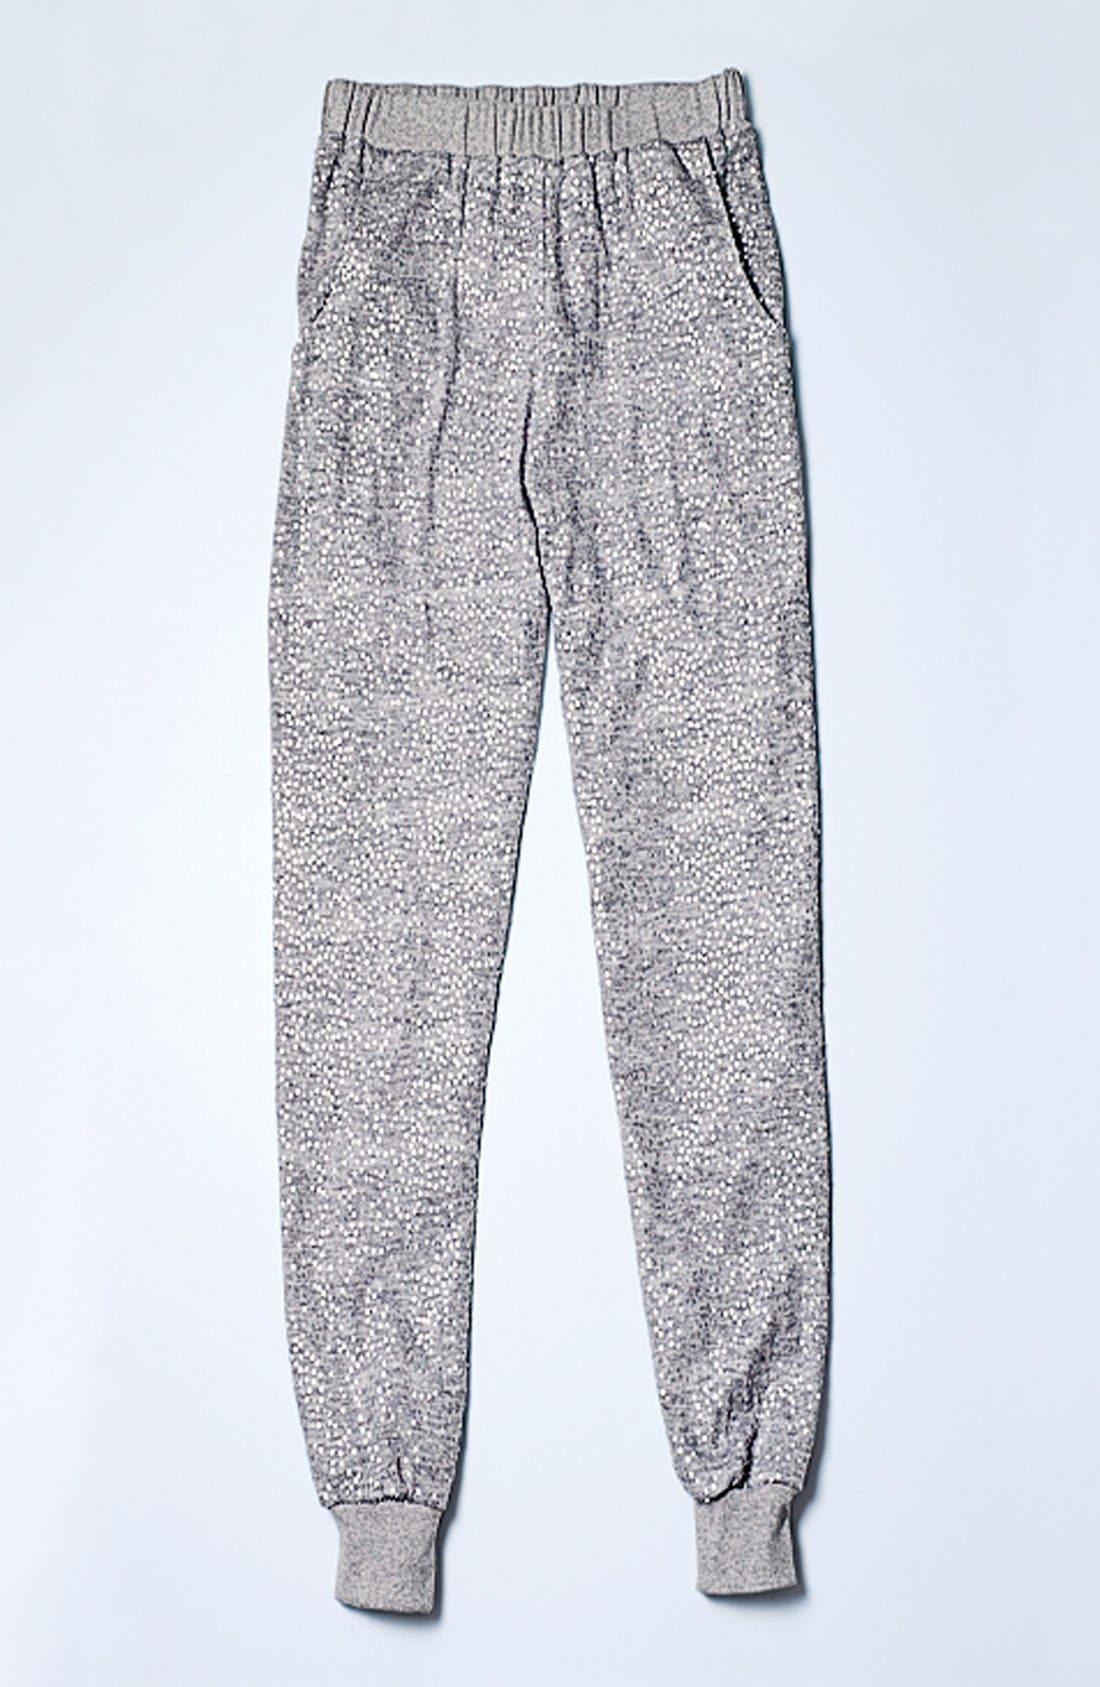 Sequin Track Pants,                             Alternate thumbnail 4, color,                             Grey